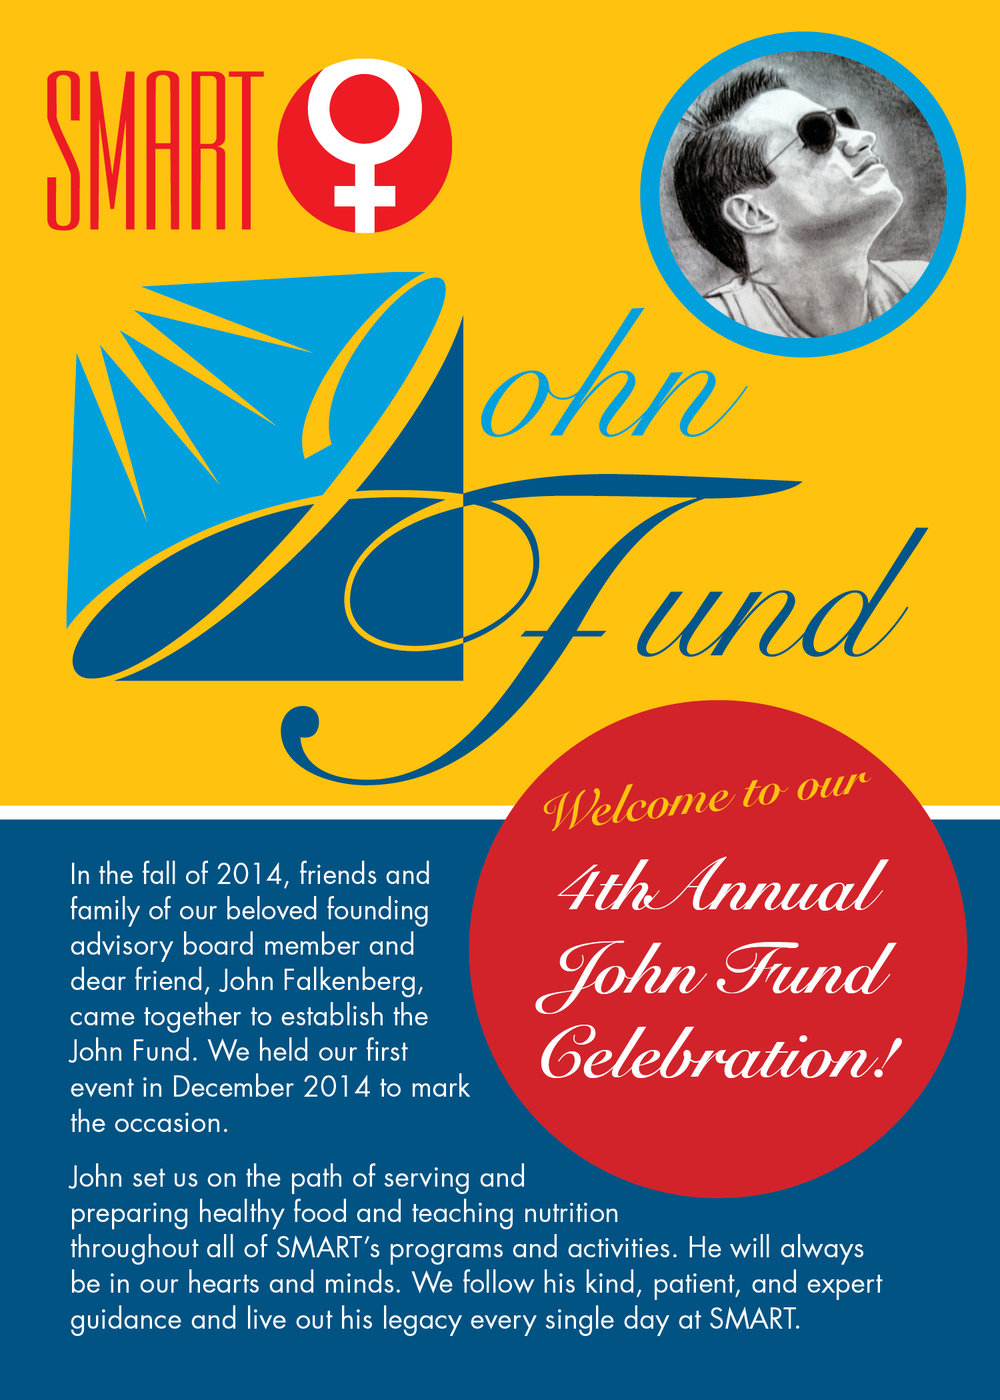 17 John Fund palmcard-front.jpg